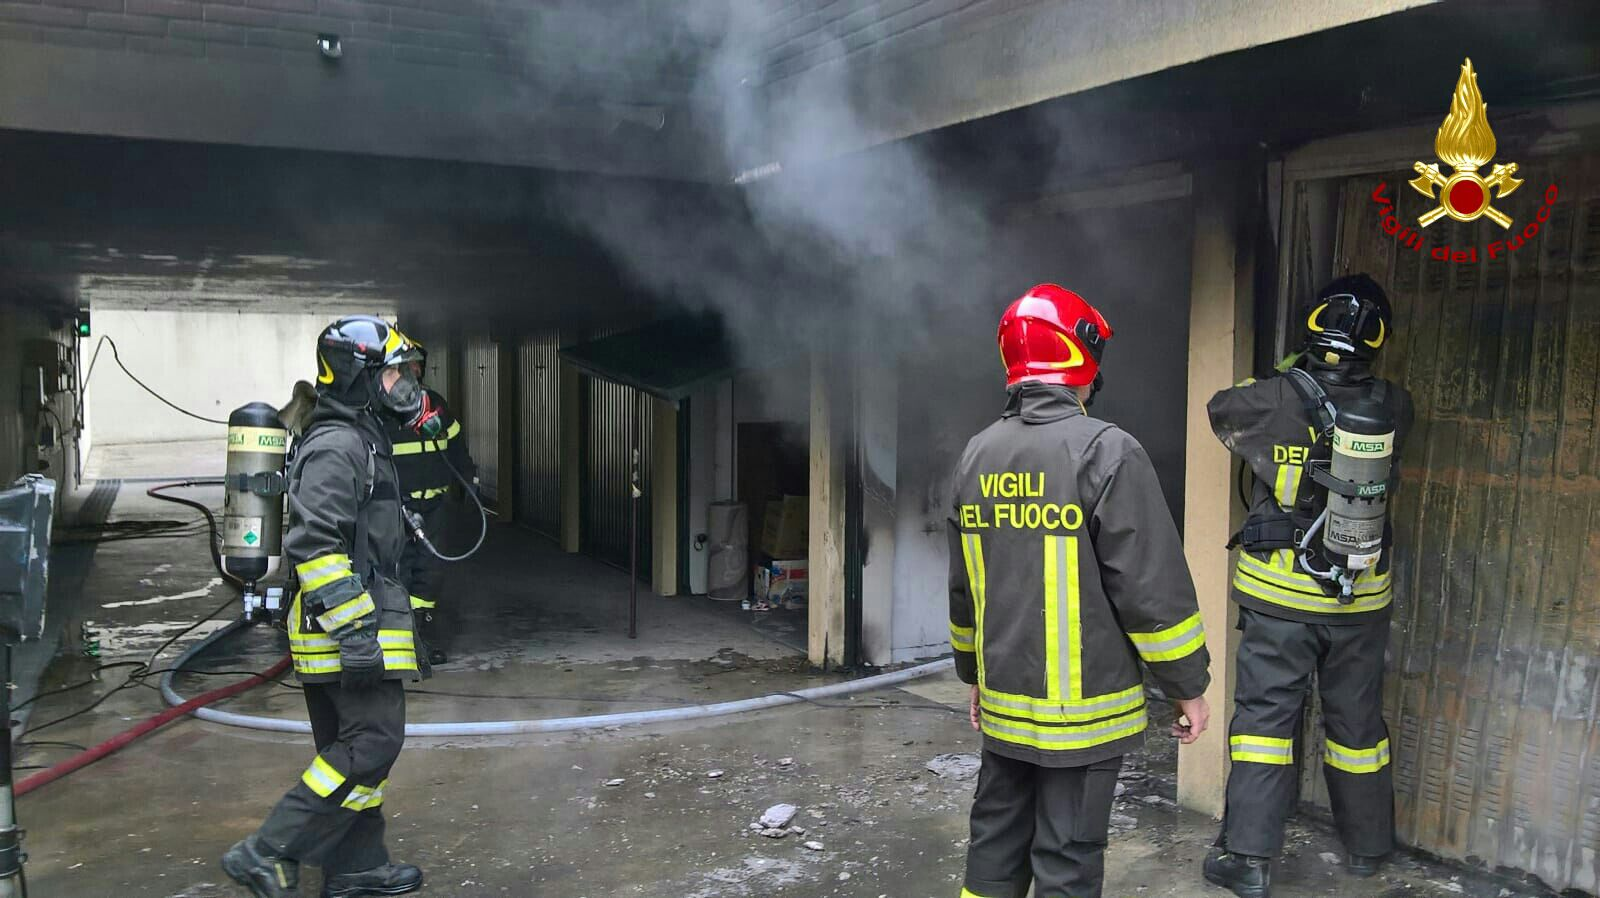 A fuoco un garage in via Frescobaldi